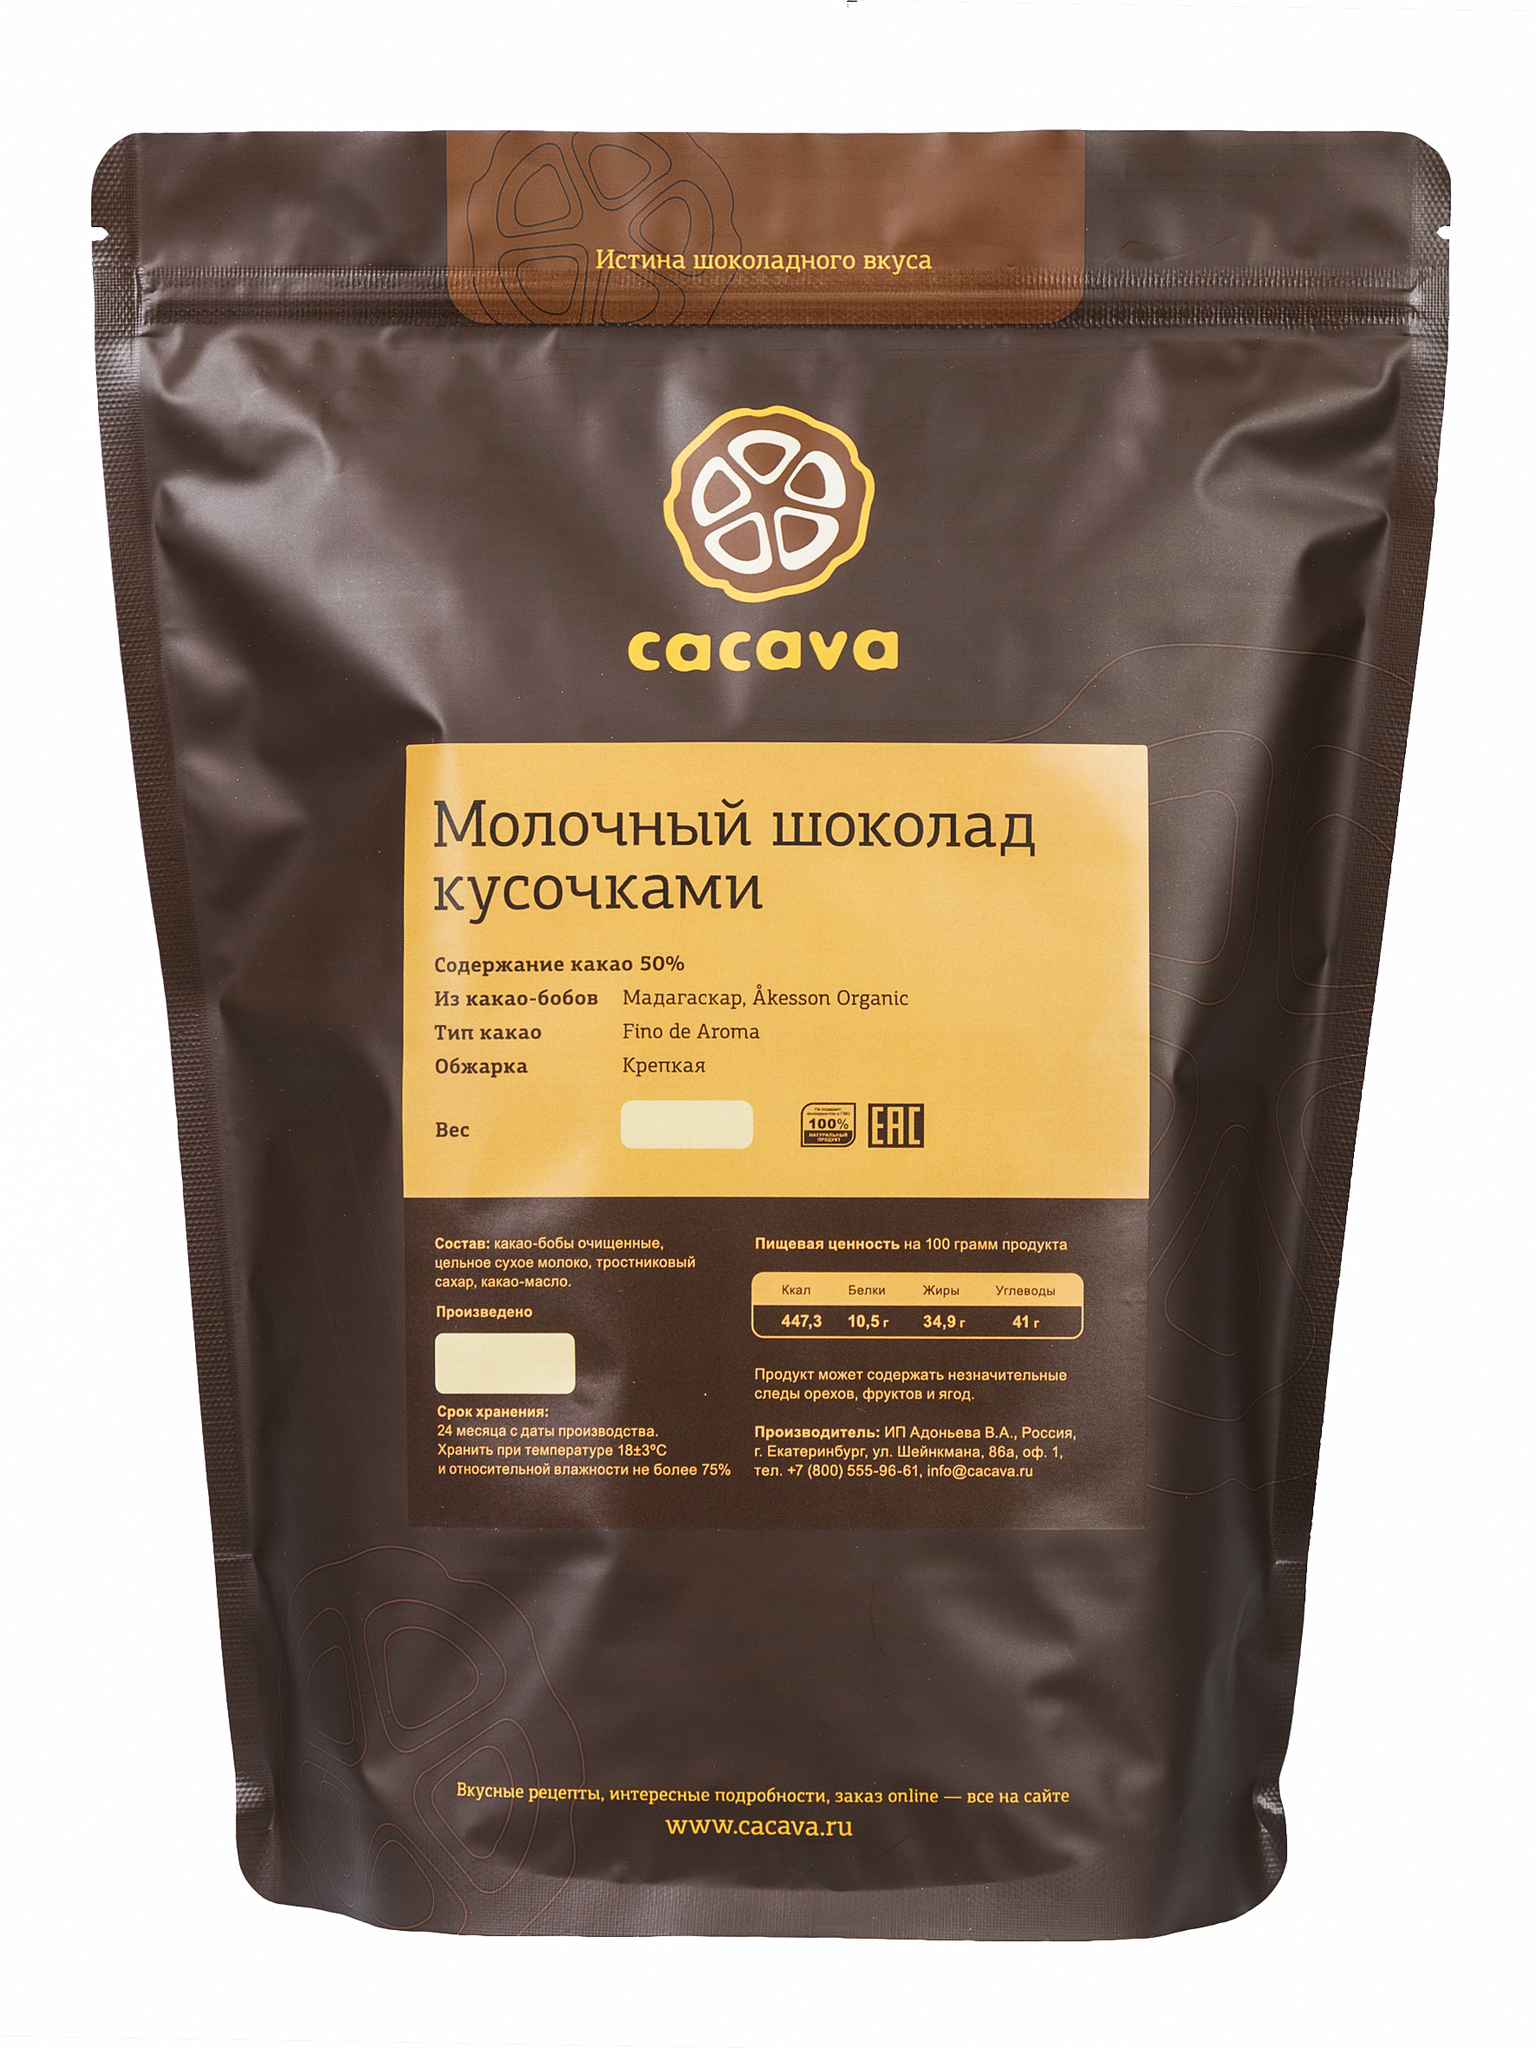 Молочный шоколад 50 % какао (Мадагаскар, Åkesson), упаковка 1 кг